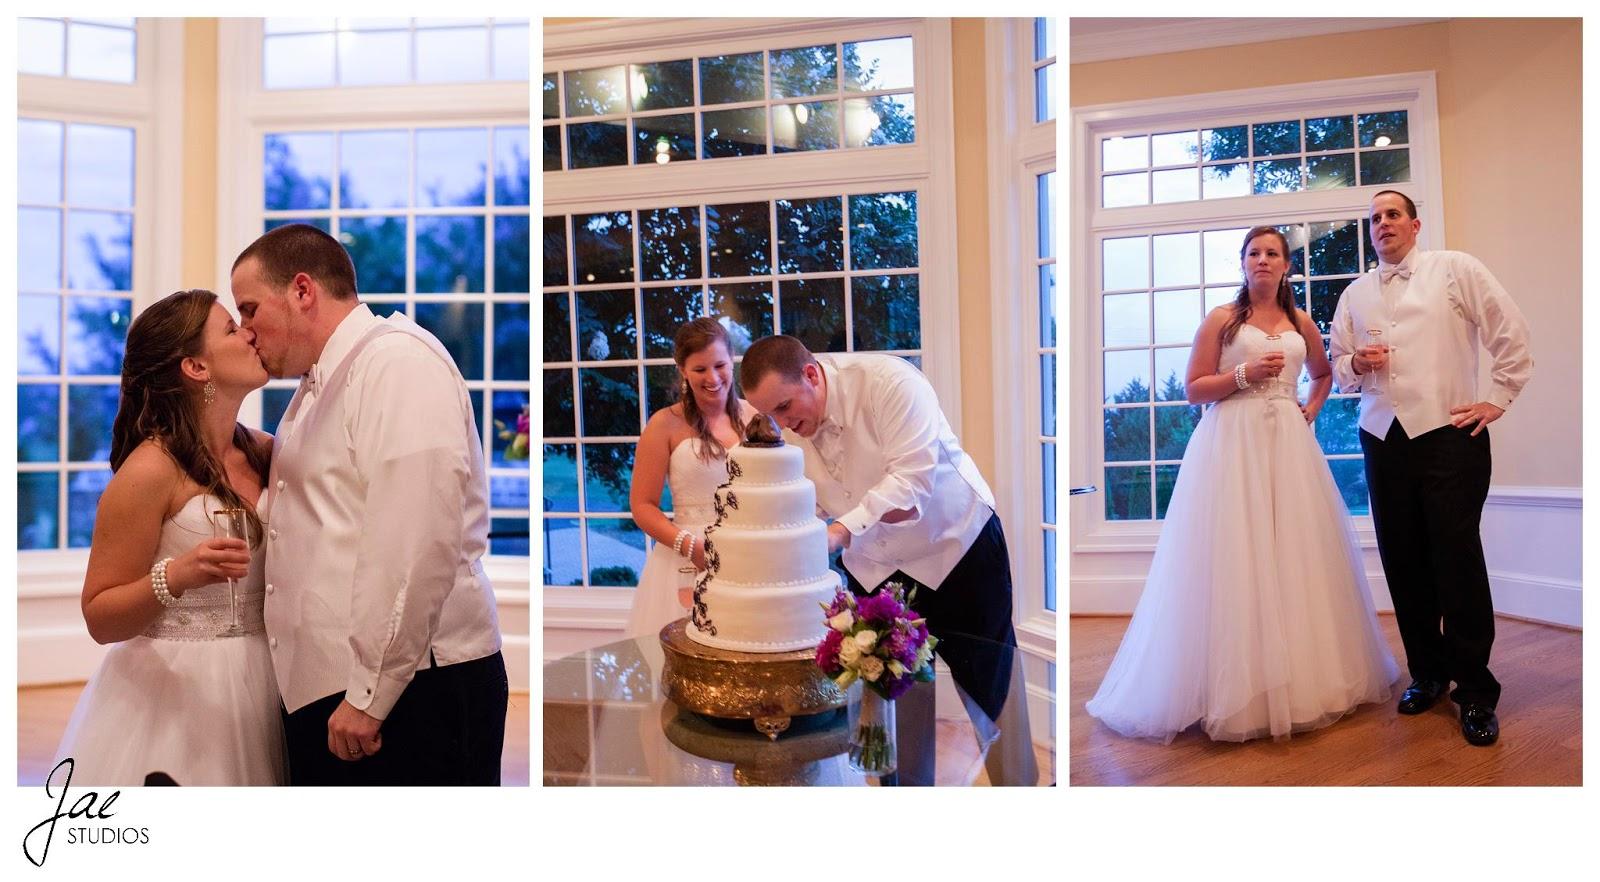 Jonathan and Julie, Bird cage, West Manor Estate, Wedding, Lynchburg, Virginia, Jae Studios, cake, purple, kiss, wedding dress, tuxedo, bride, groom, window, drink, cutting the cake